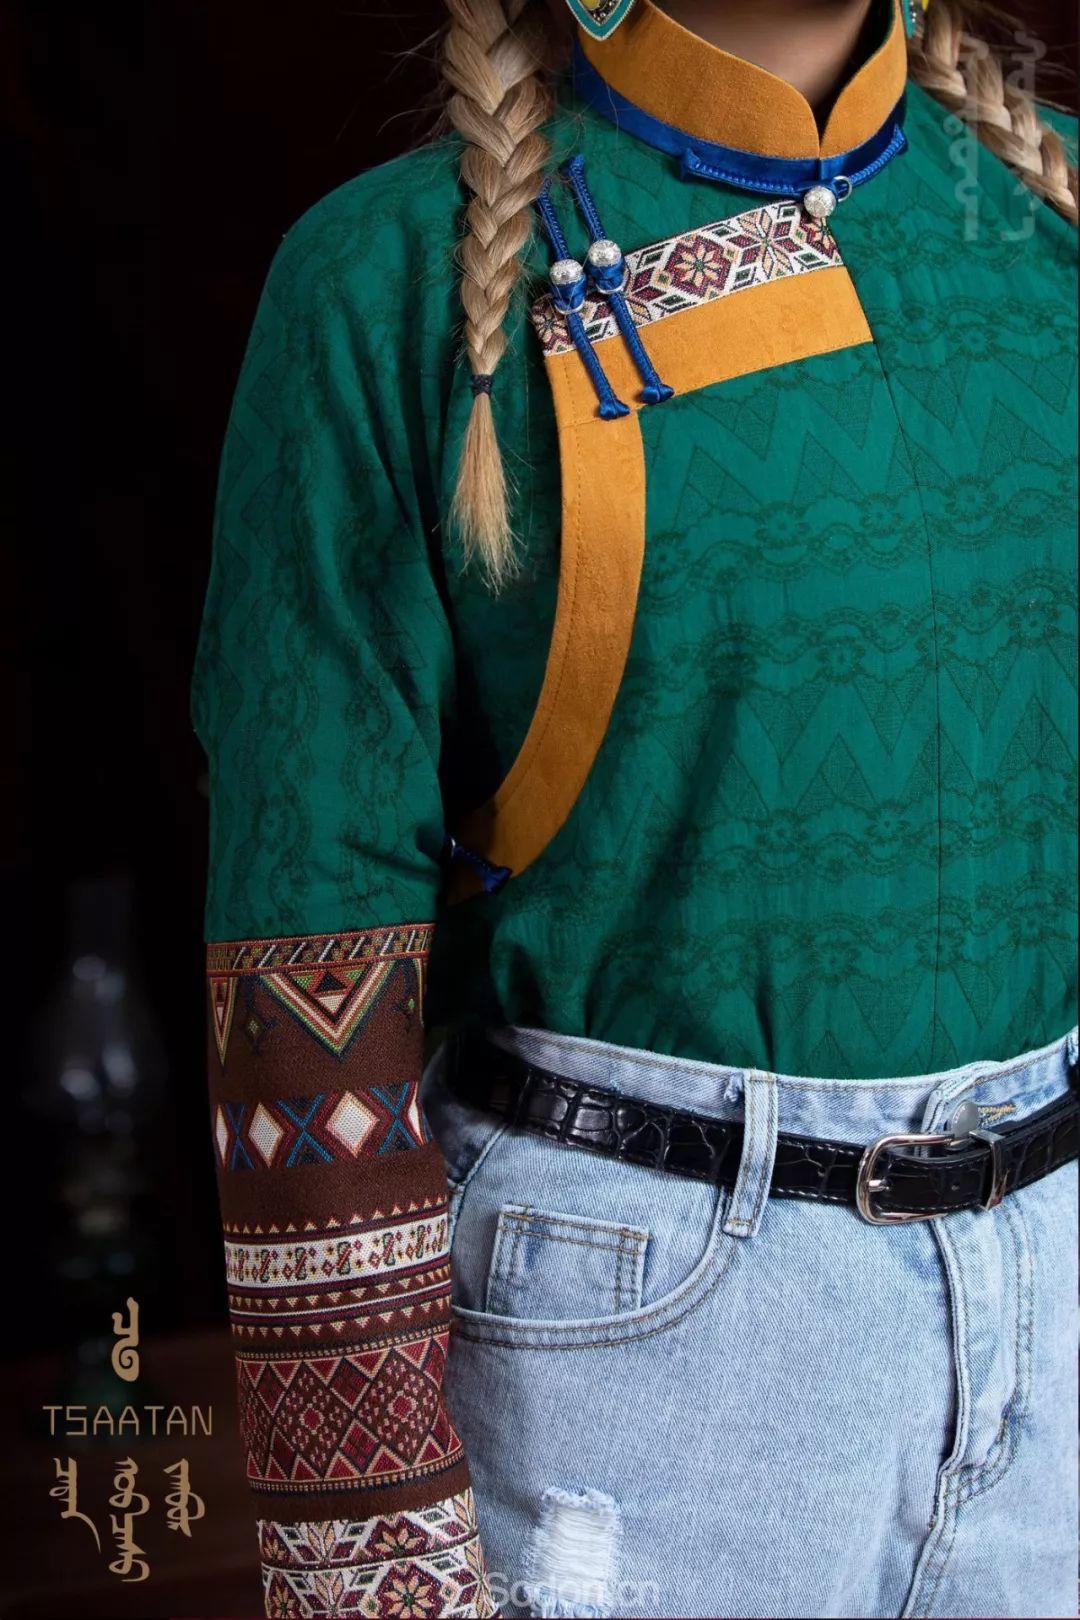 TSAATAN蒙古时装秋冬系列,来自驯鹿人的独特魅力! 第38张